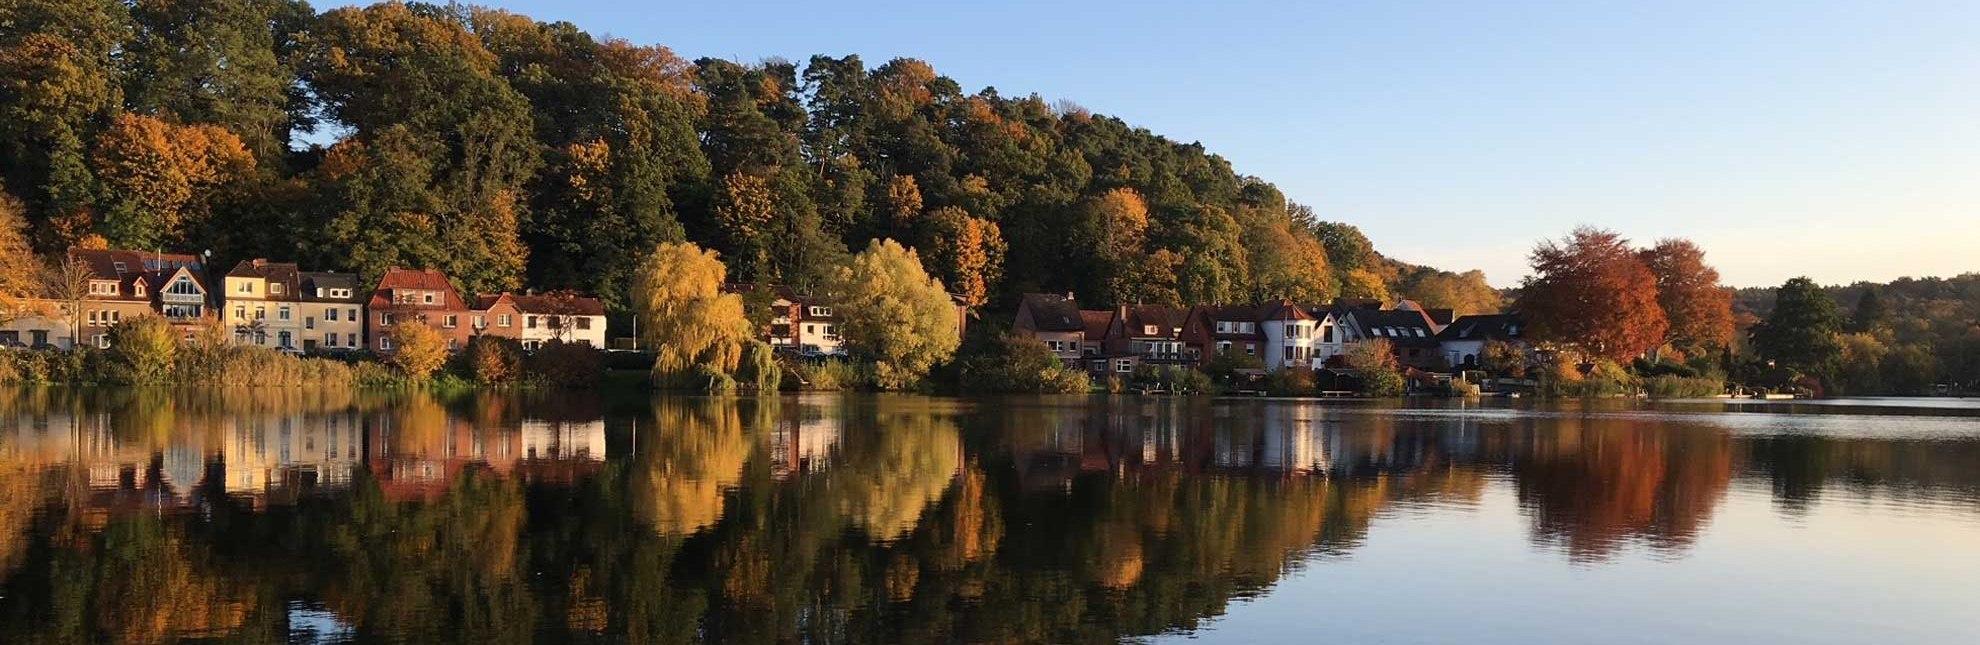 Blick auf den Möllner Schulsee, © Carina Jahnke